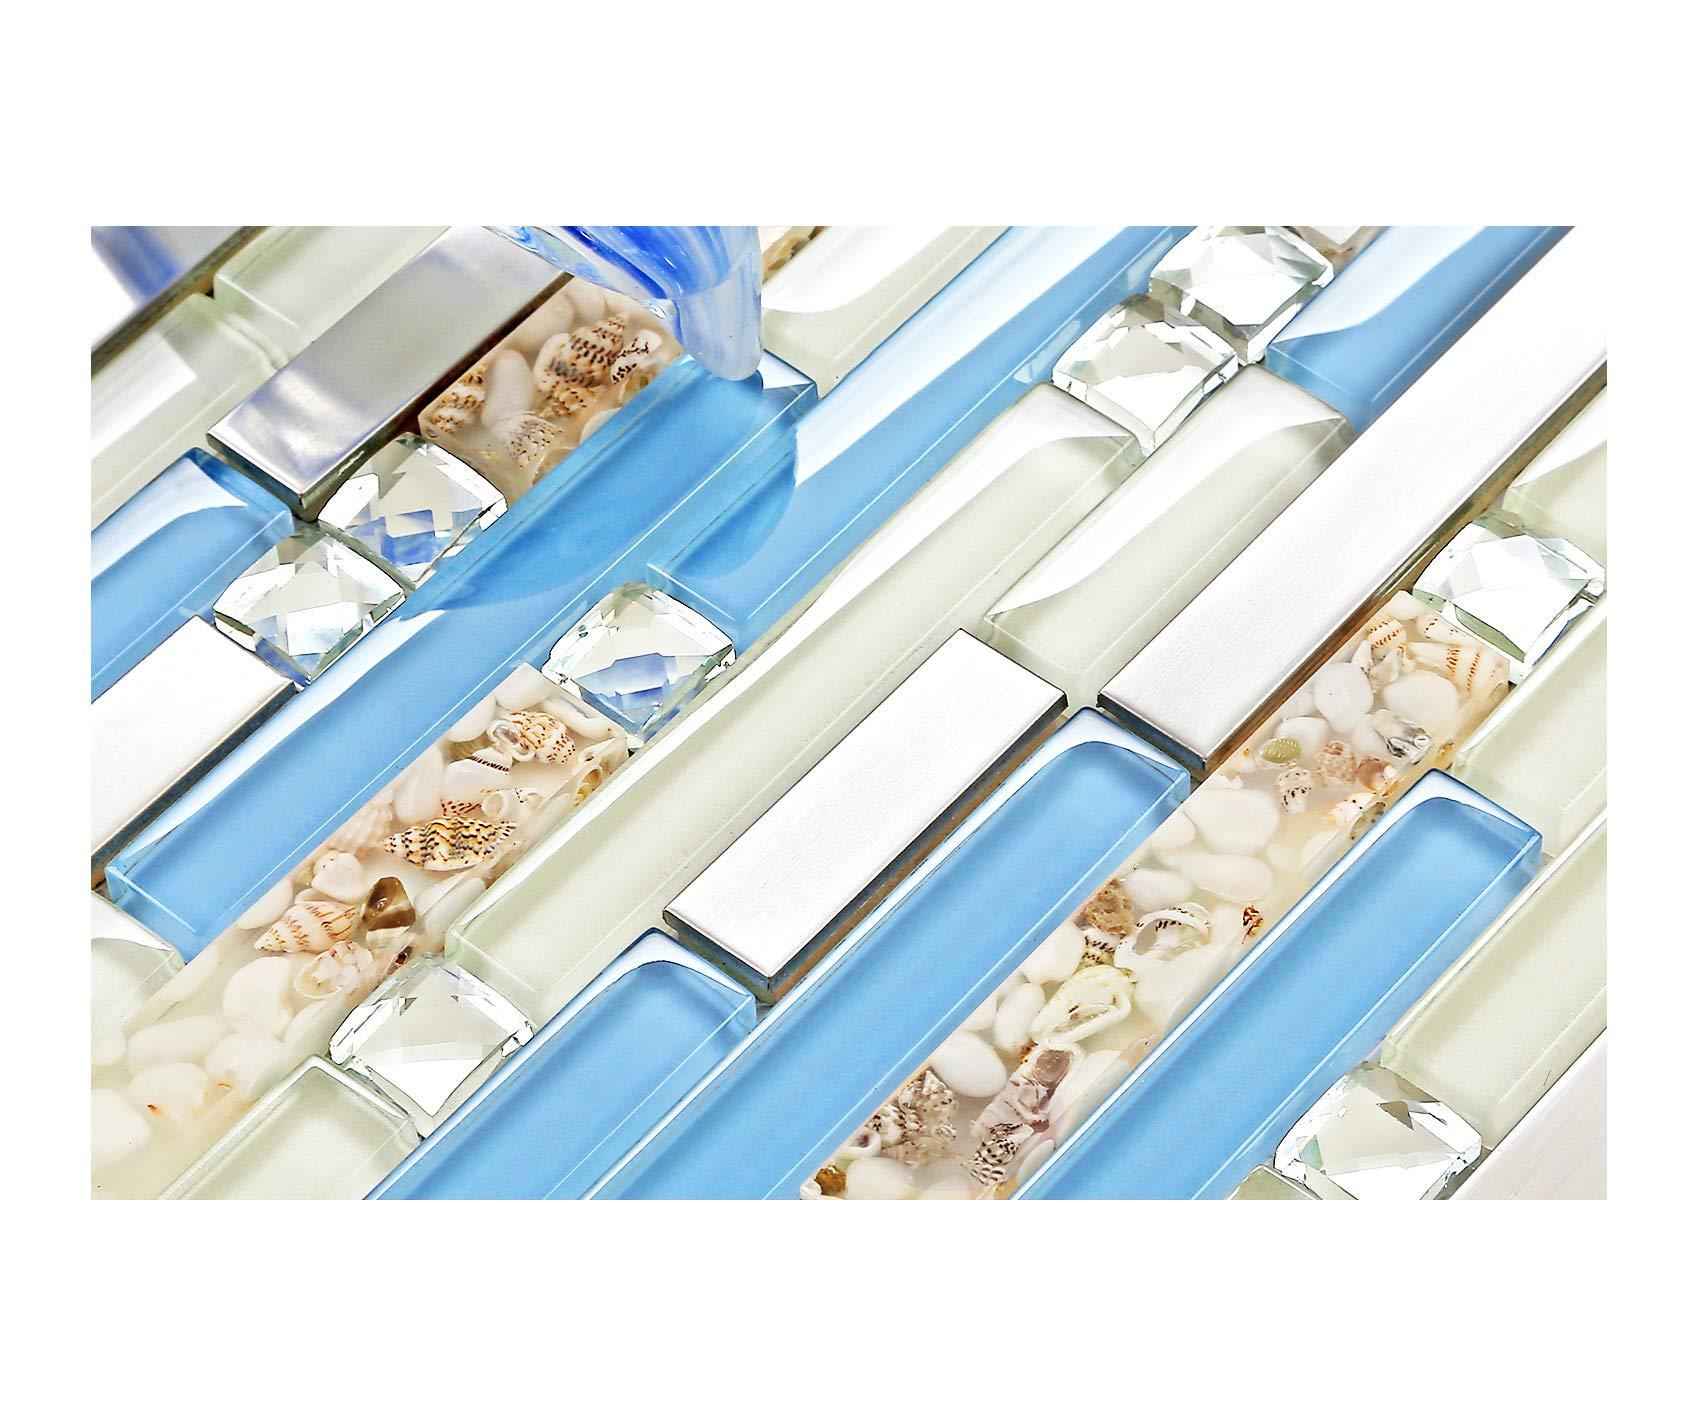 TST Glass Inner Conch Tile Beach Style Blue Cream White Brushed Steel Art Mosaic Kitchen Backsplash Bath Decor TSTNB06 (1 Sample 12x12 Inches)